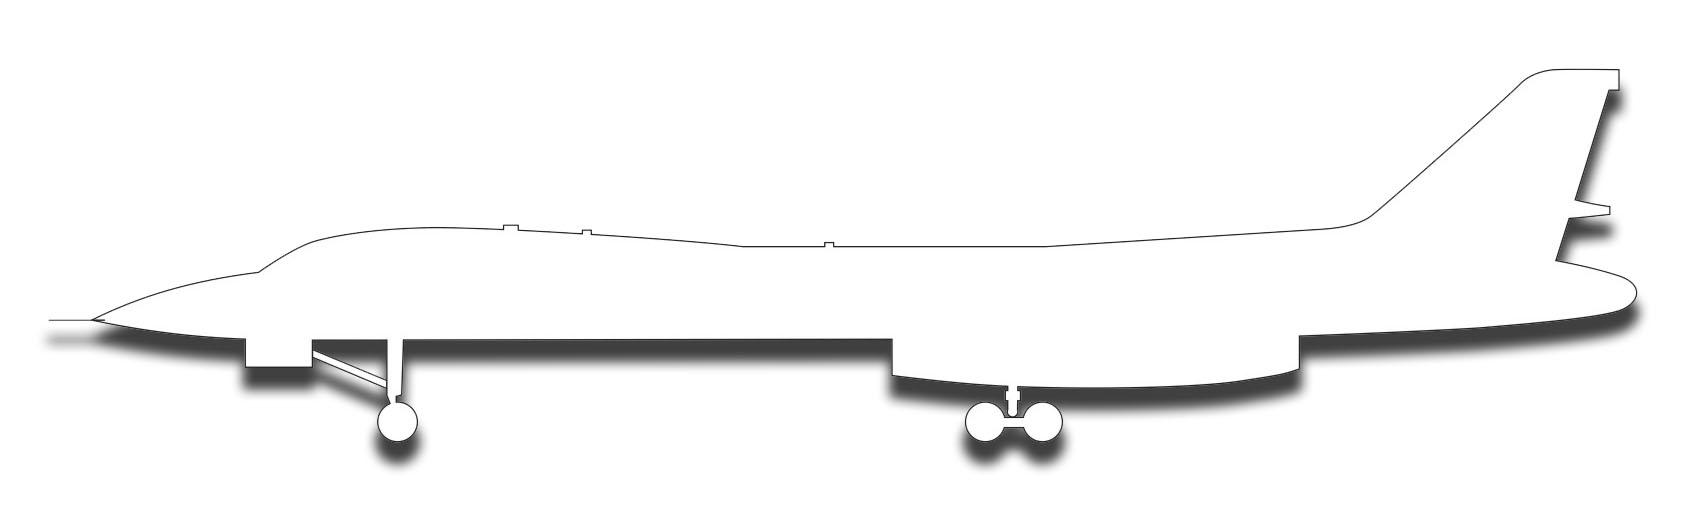 1690x516 Lancer Strategic Bomber Silhouette Sticker Decal